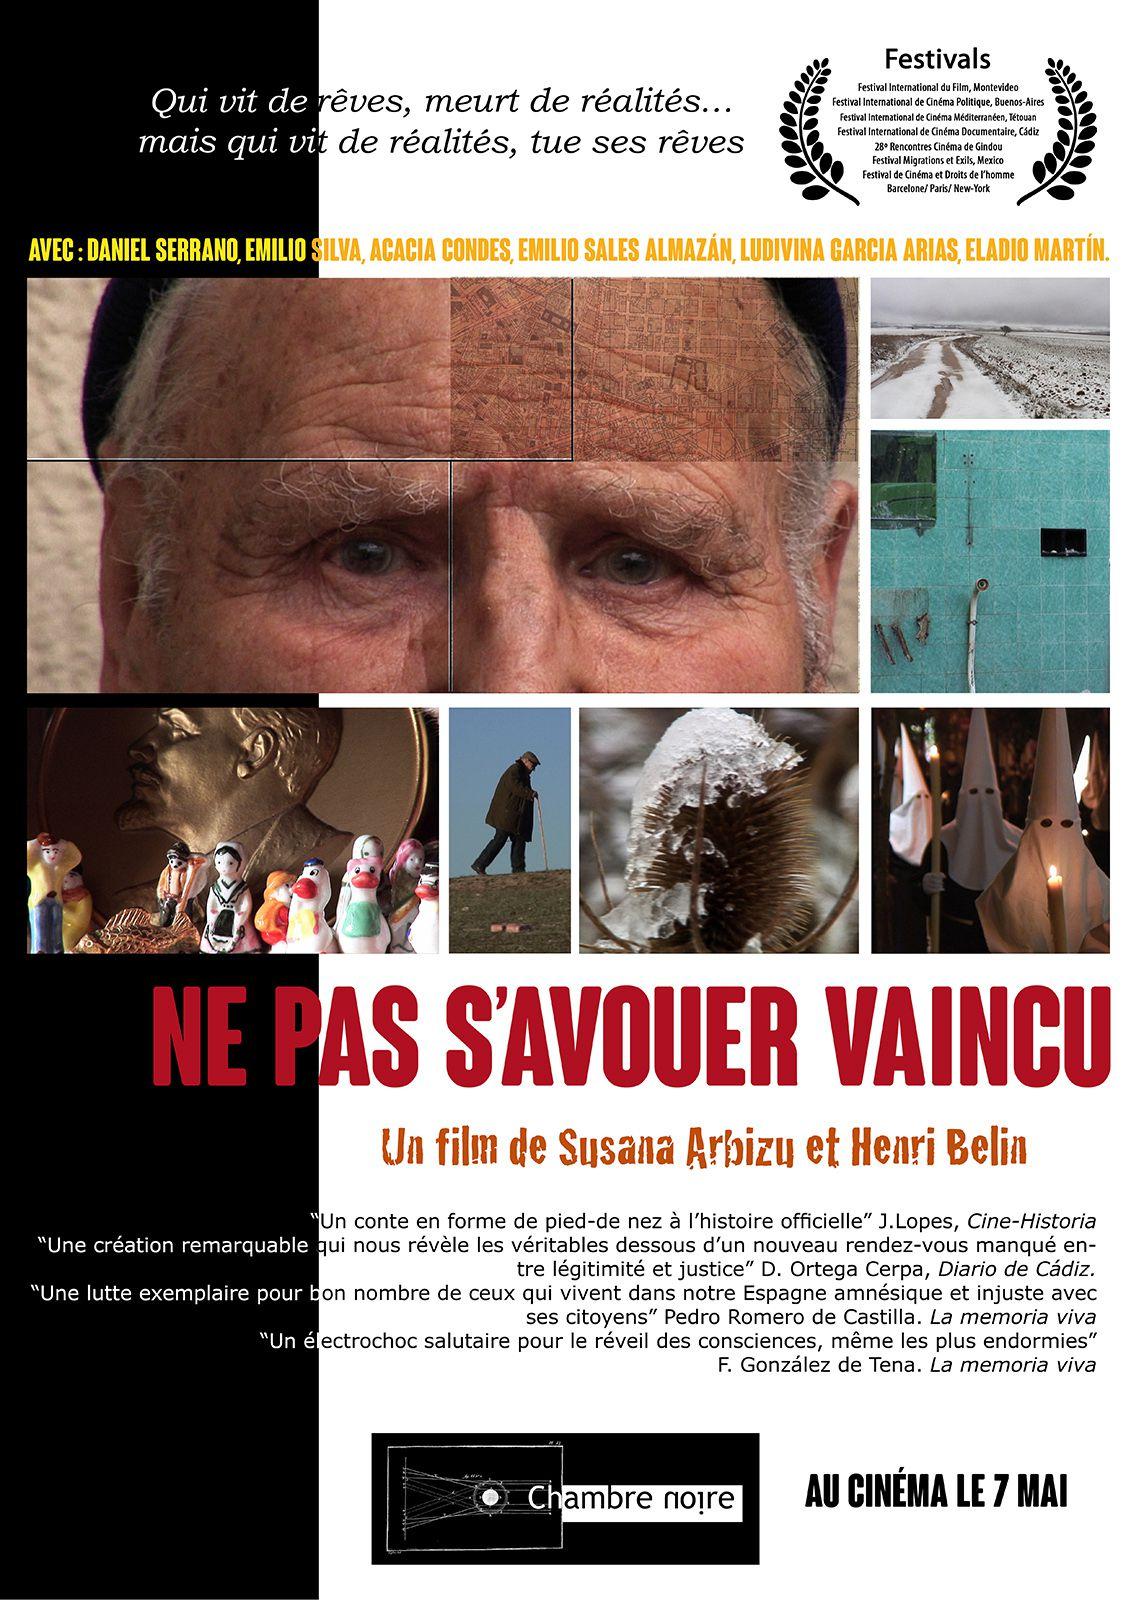 Ne pas s'avouer vaincu - Documentaire (2014)